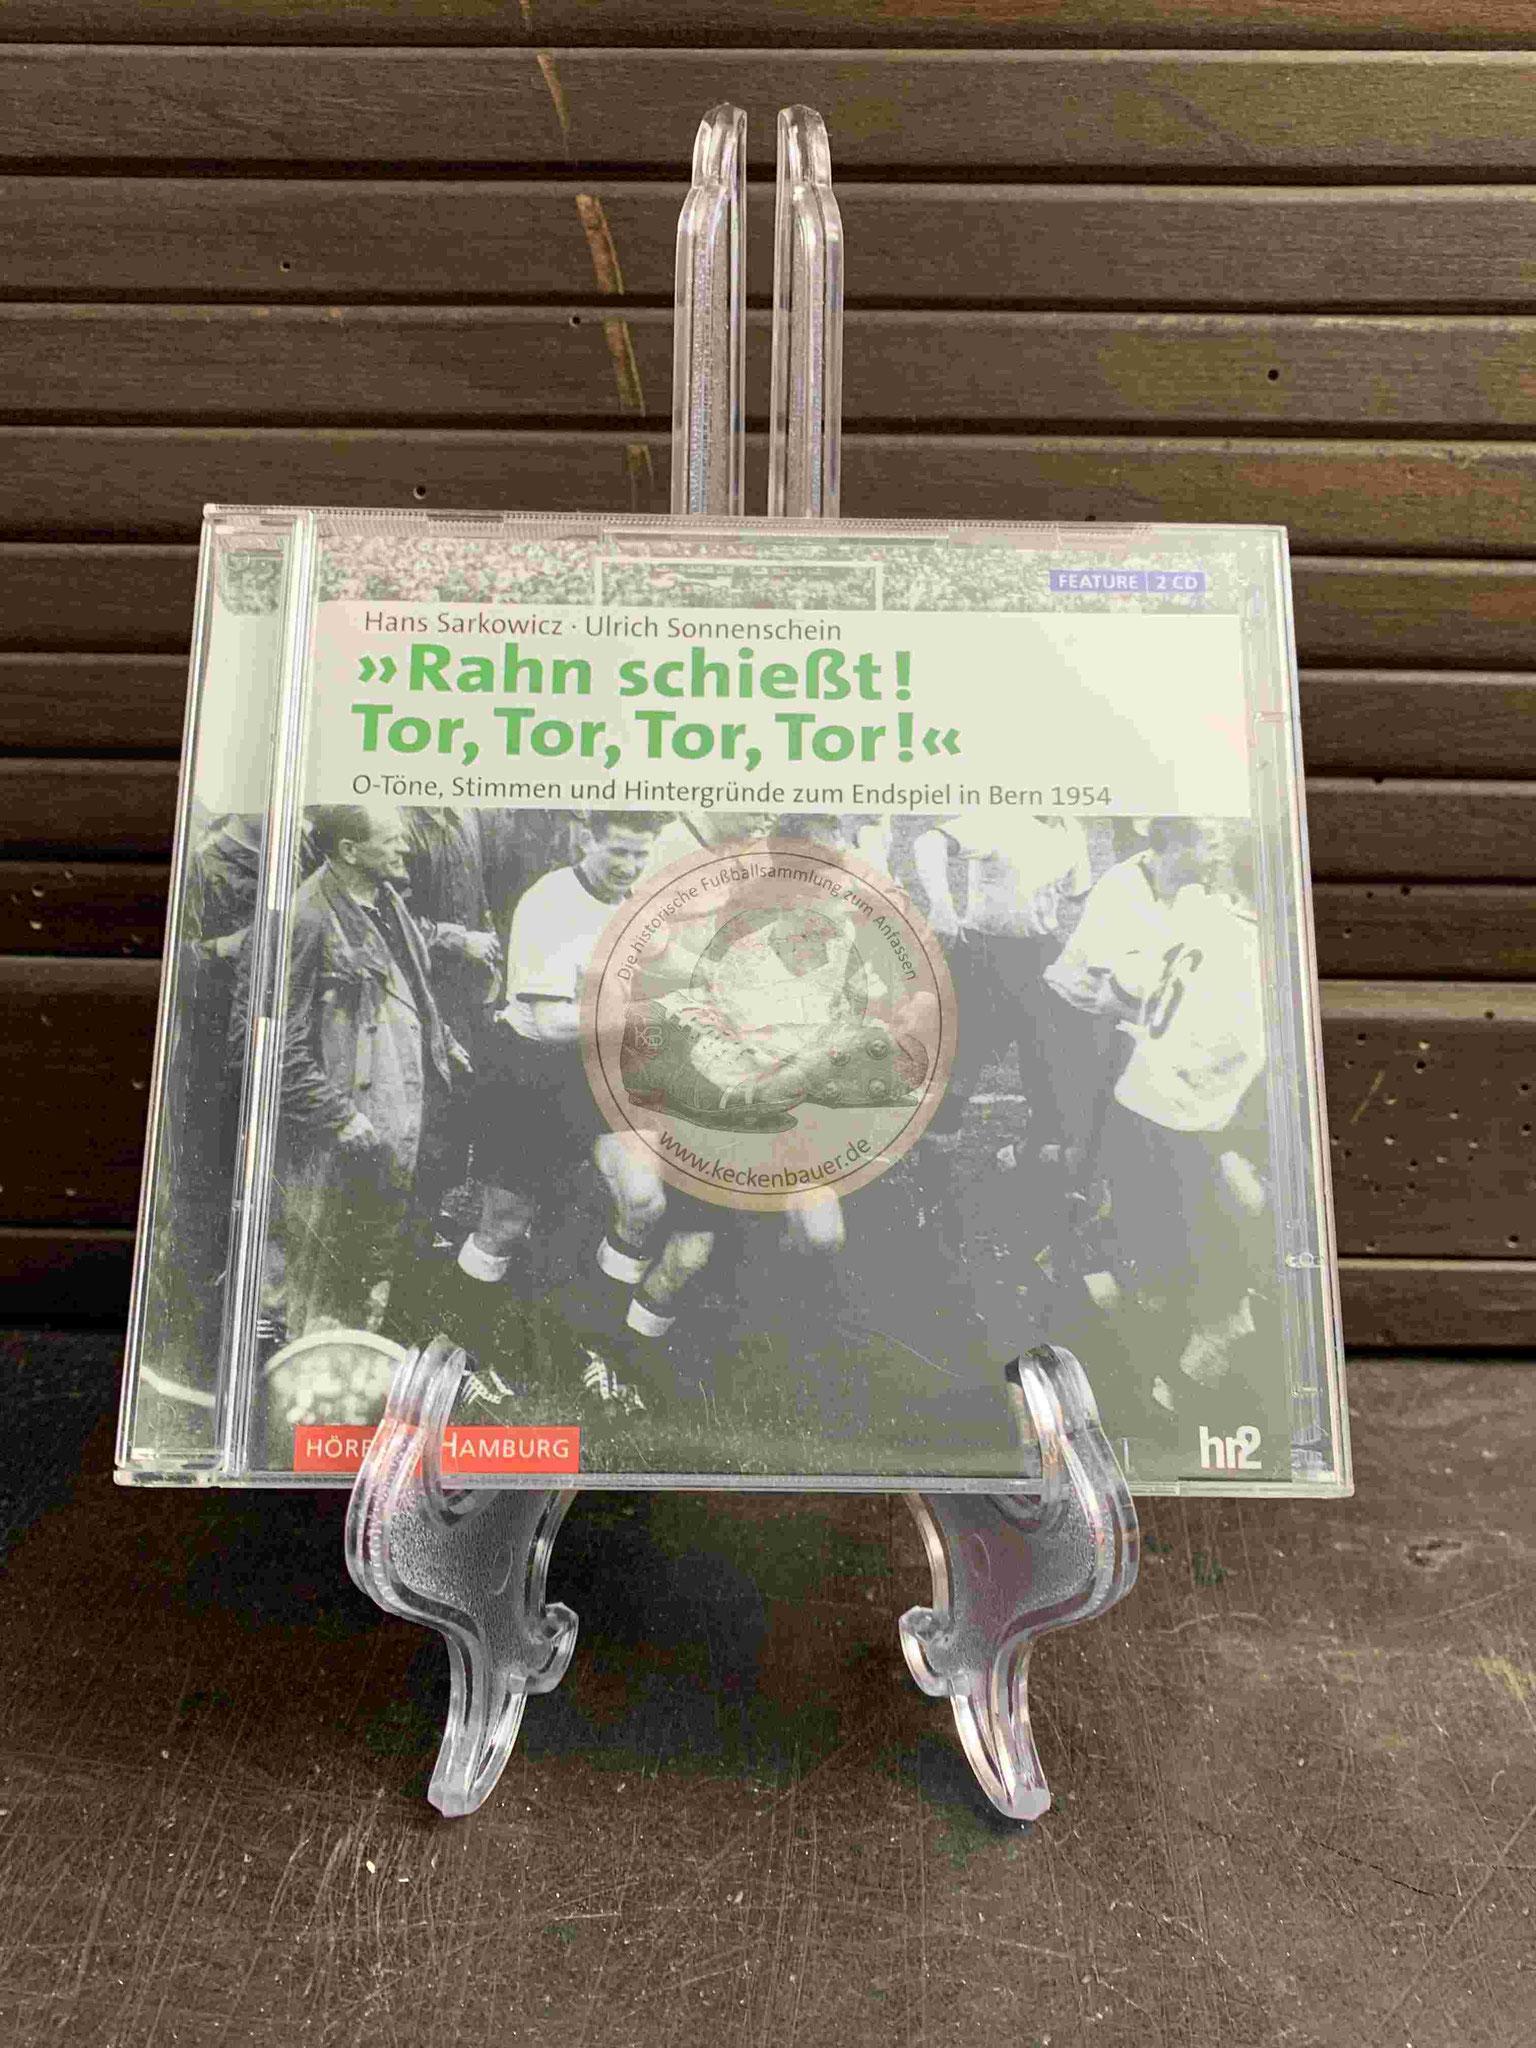 20040401 Rahn schießt Tor,Tor,Tor,Tor!